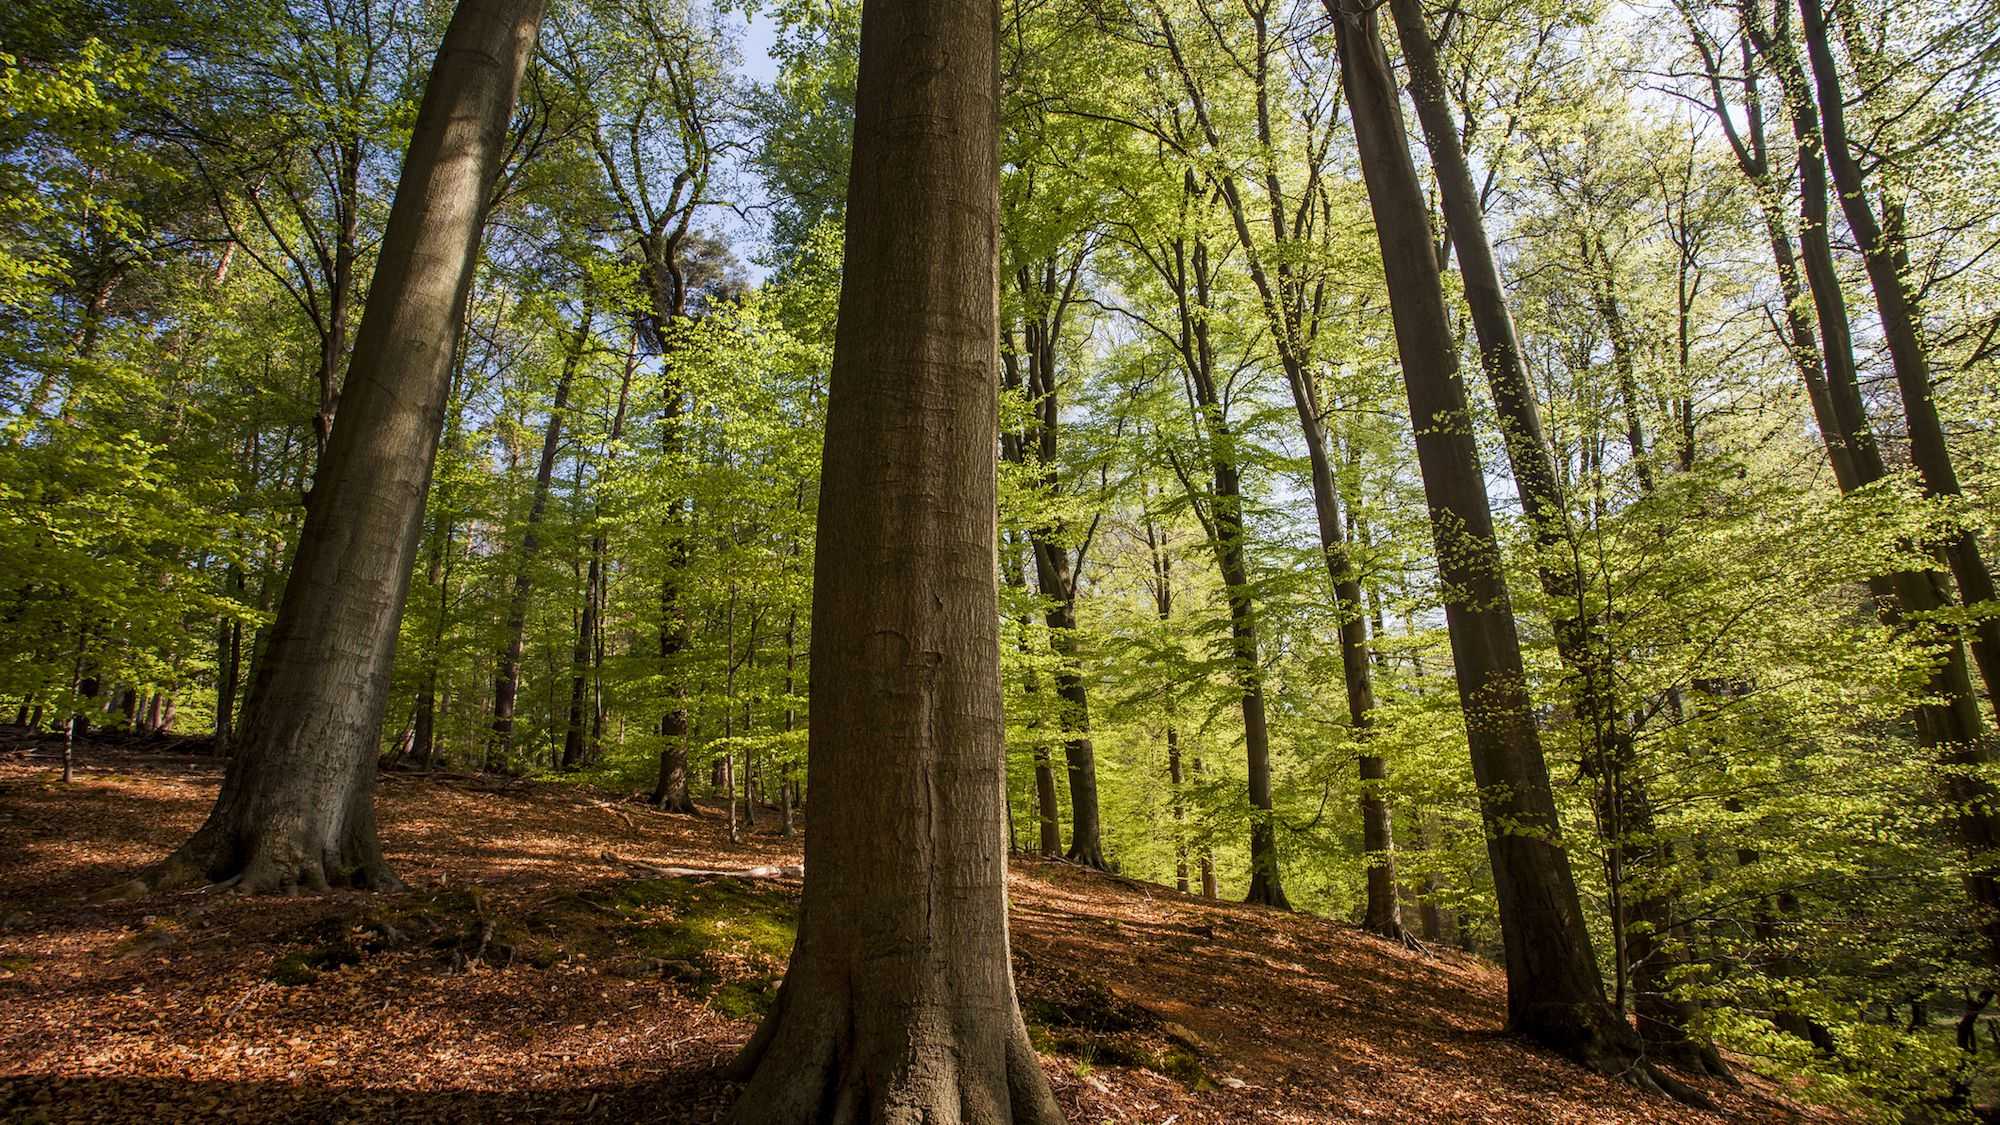 Wood tree hairwood pic